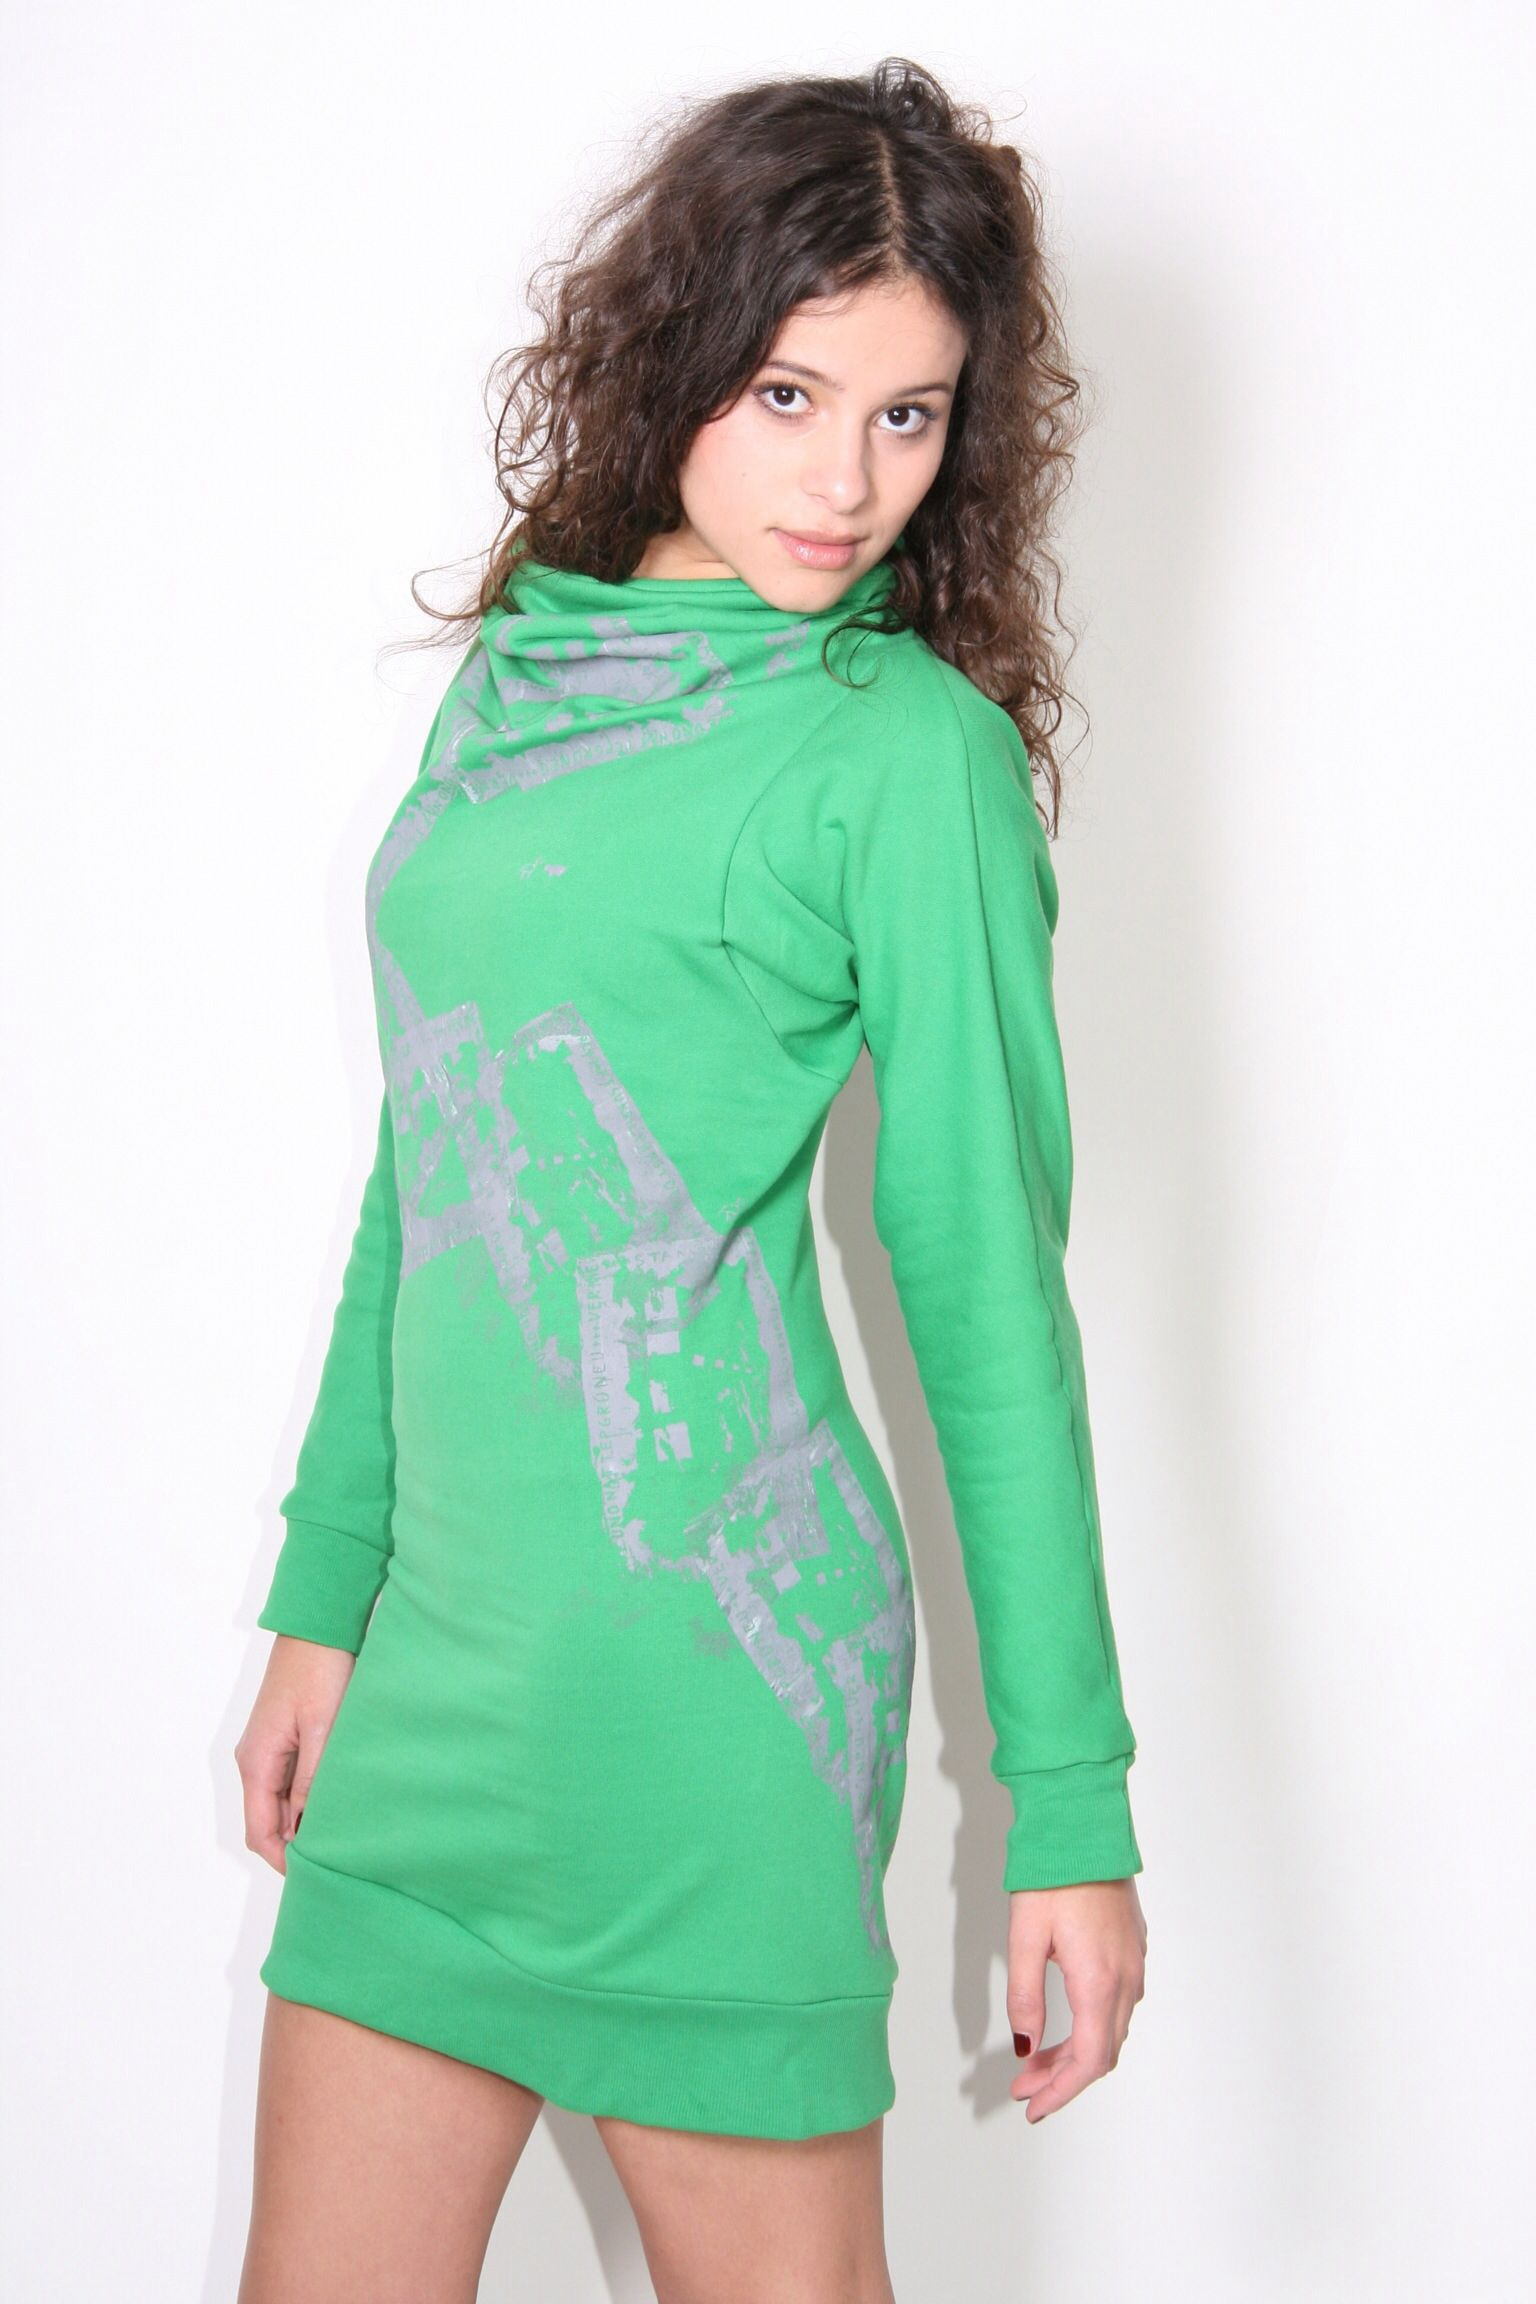 Grünes Baumwollkleid  Baumwollkleider Grünes Kleid Kleider